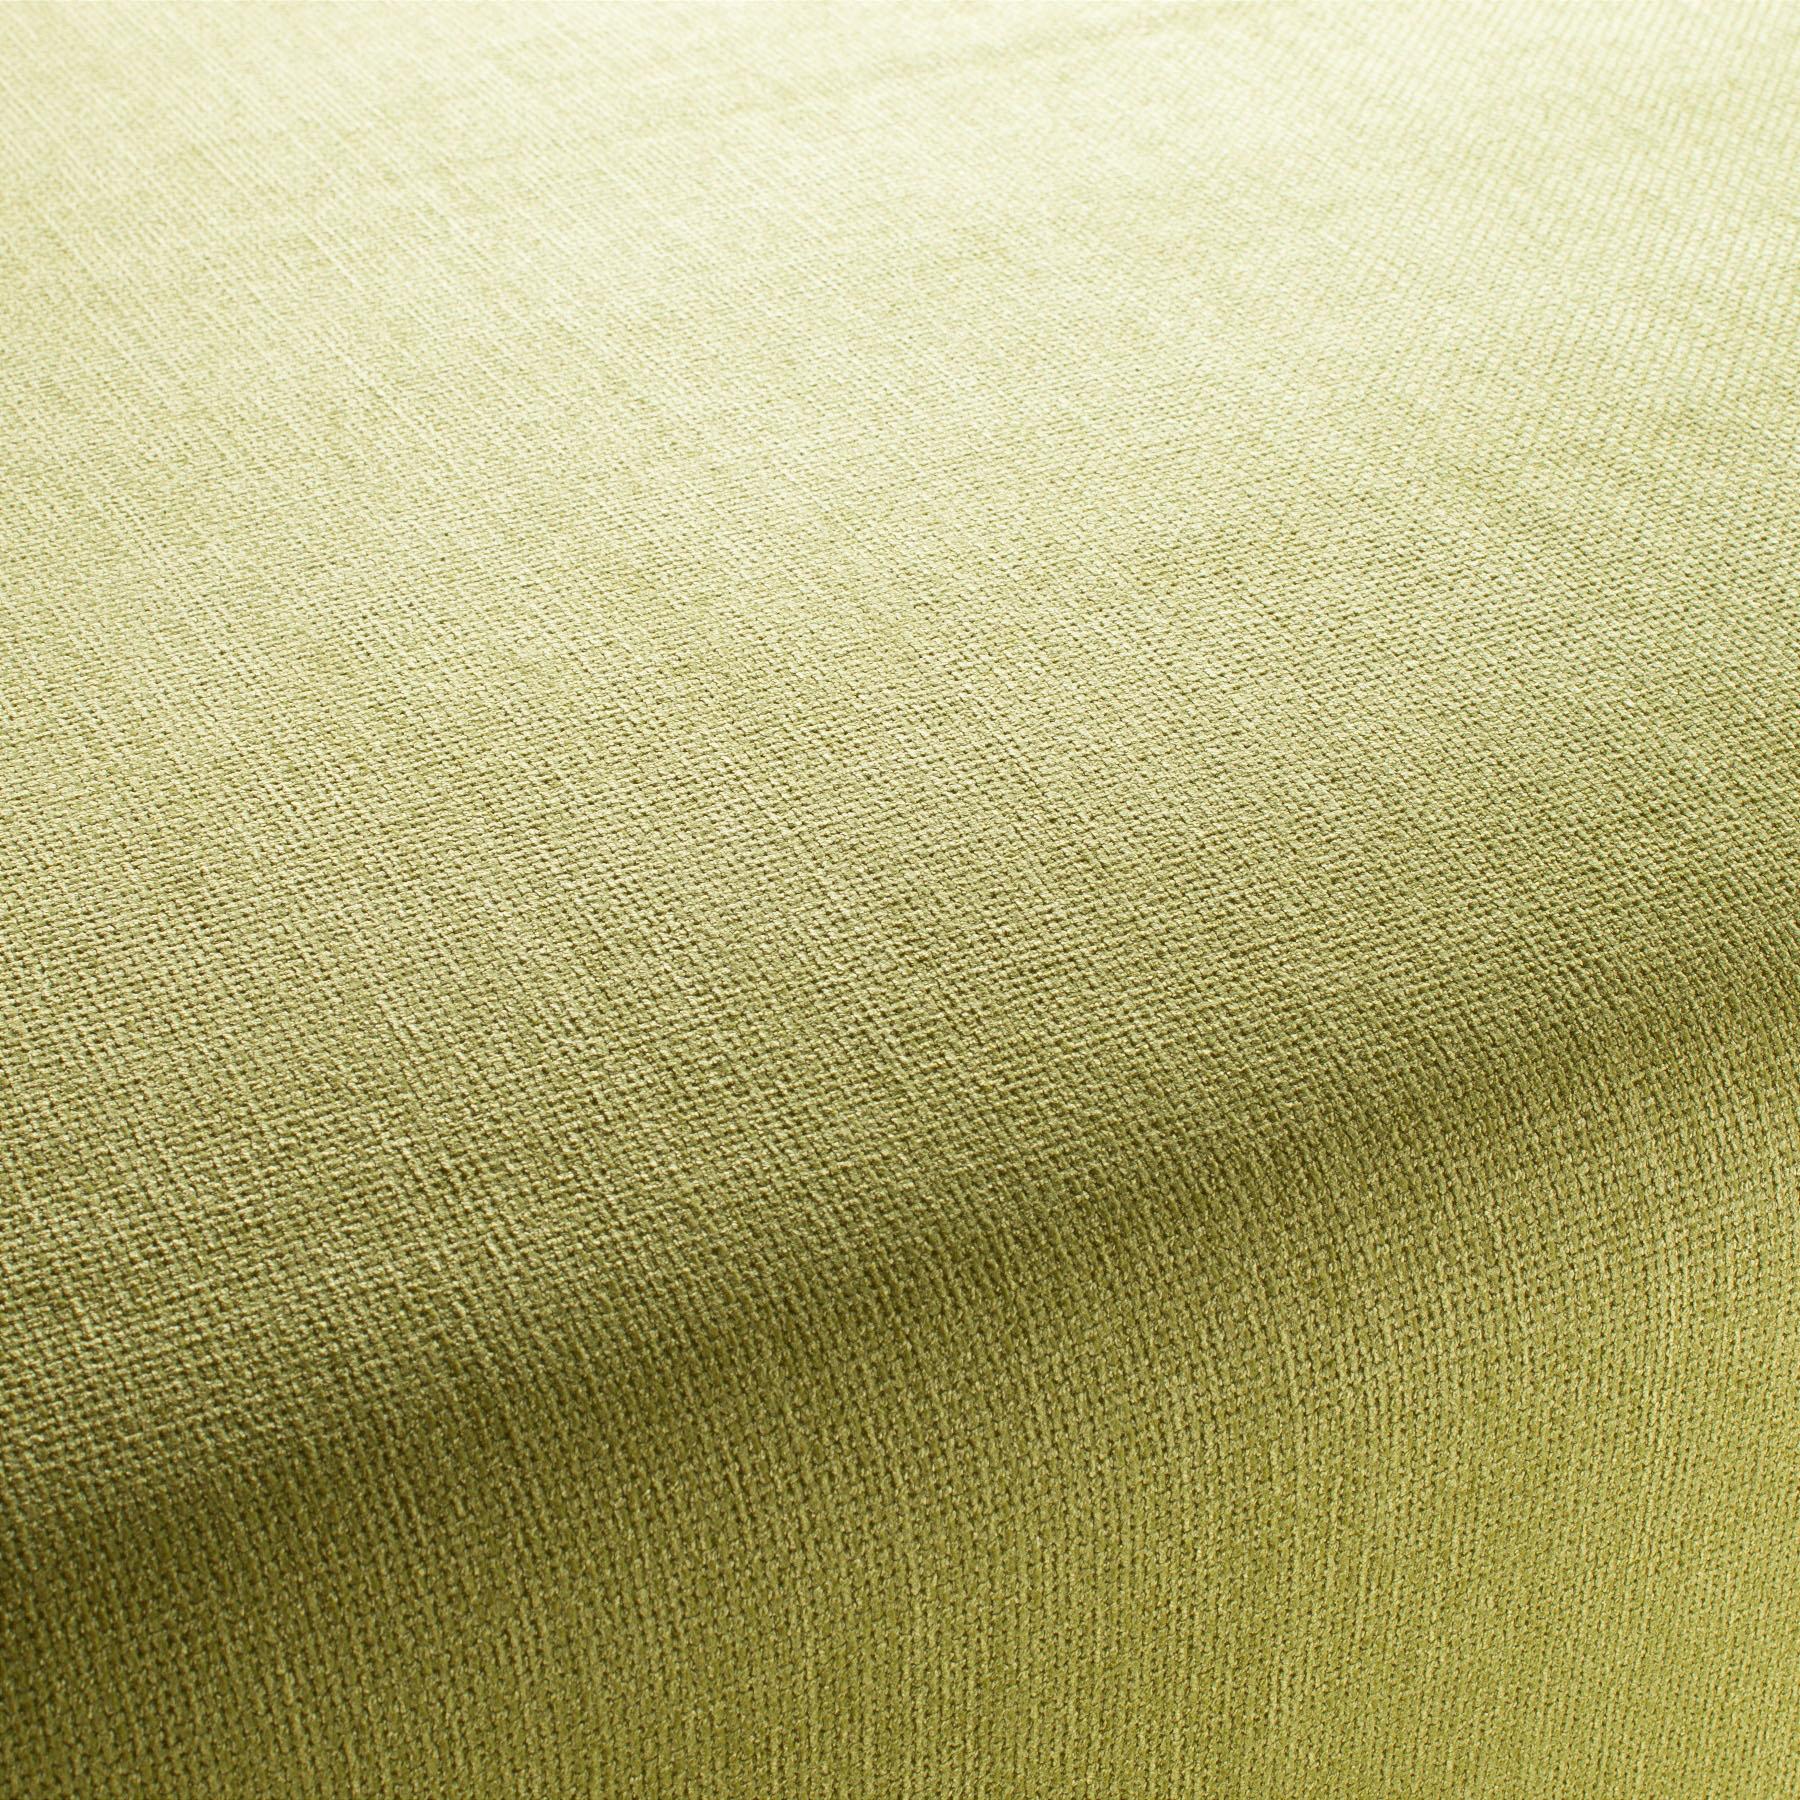 upholstery fabric toro vol 3 1 1243 031 jab anstoetz. Black Bedroom Furniture Sets. Home Design Ideas